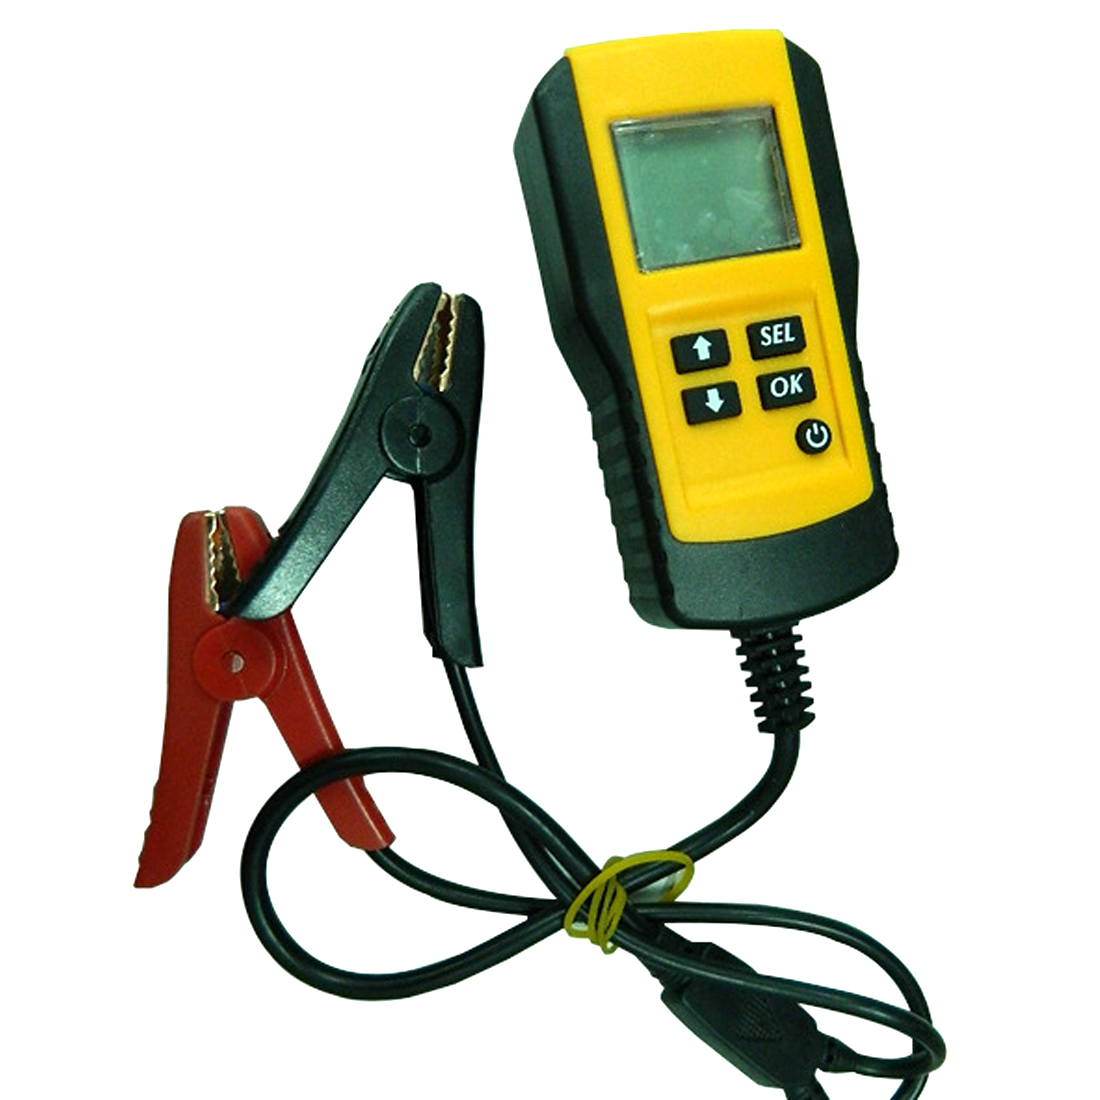 Car LCD Digital Battery Test Analyzer 1pc 12V Car Battery Tester Vehicle Auto System Analyzer Voltage ohm CCA